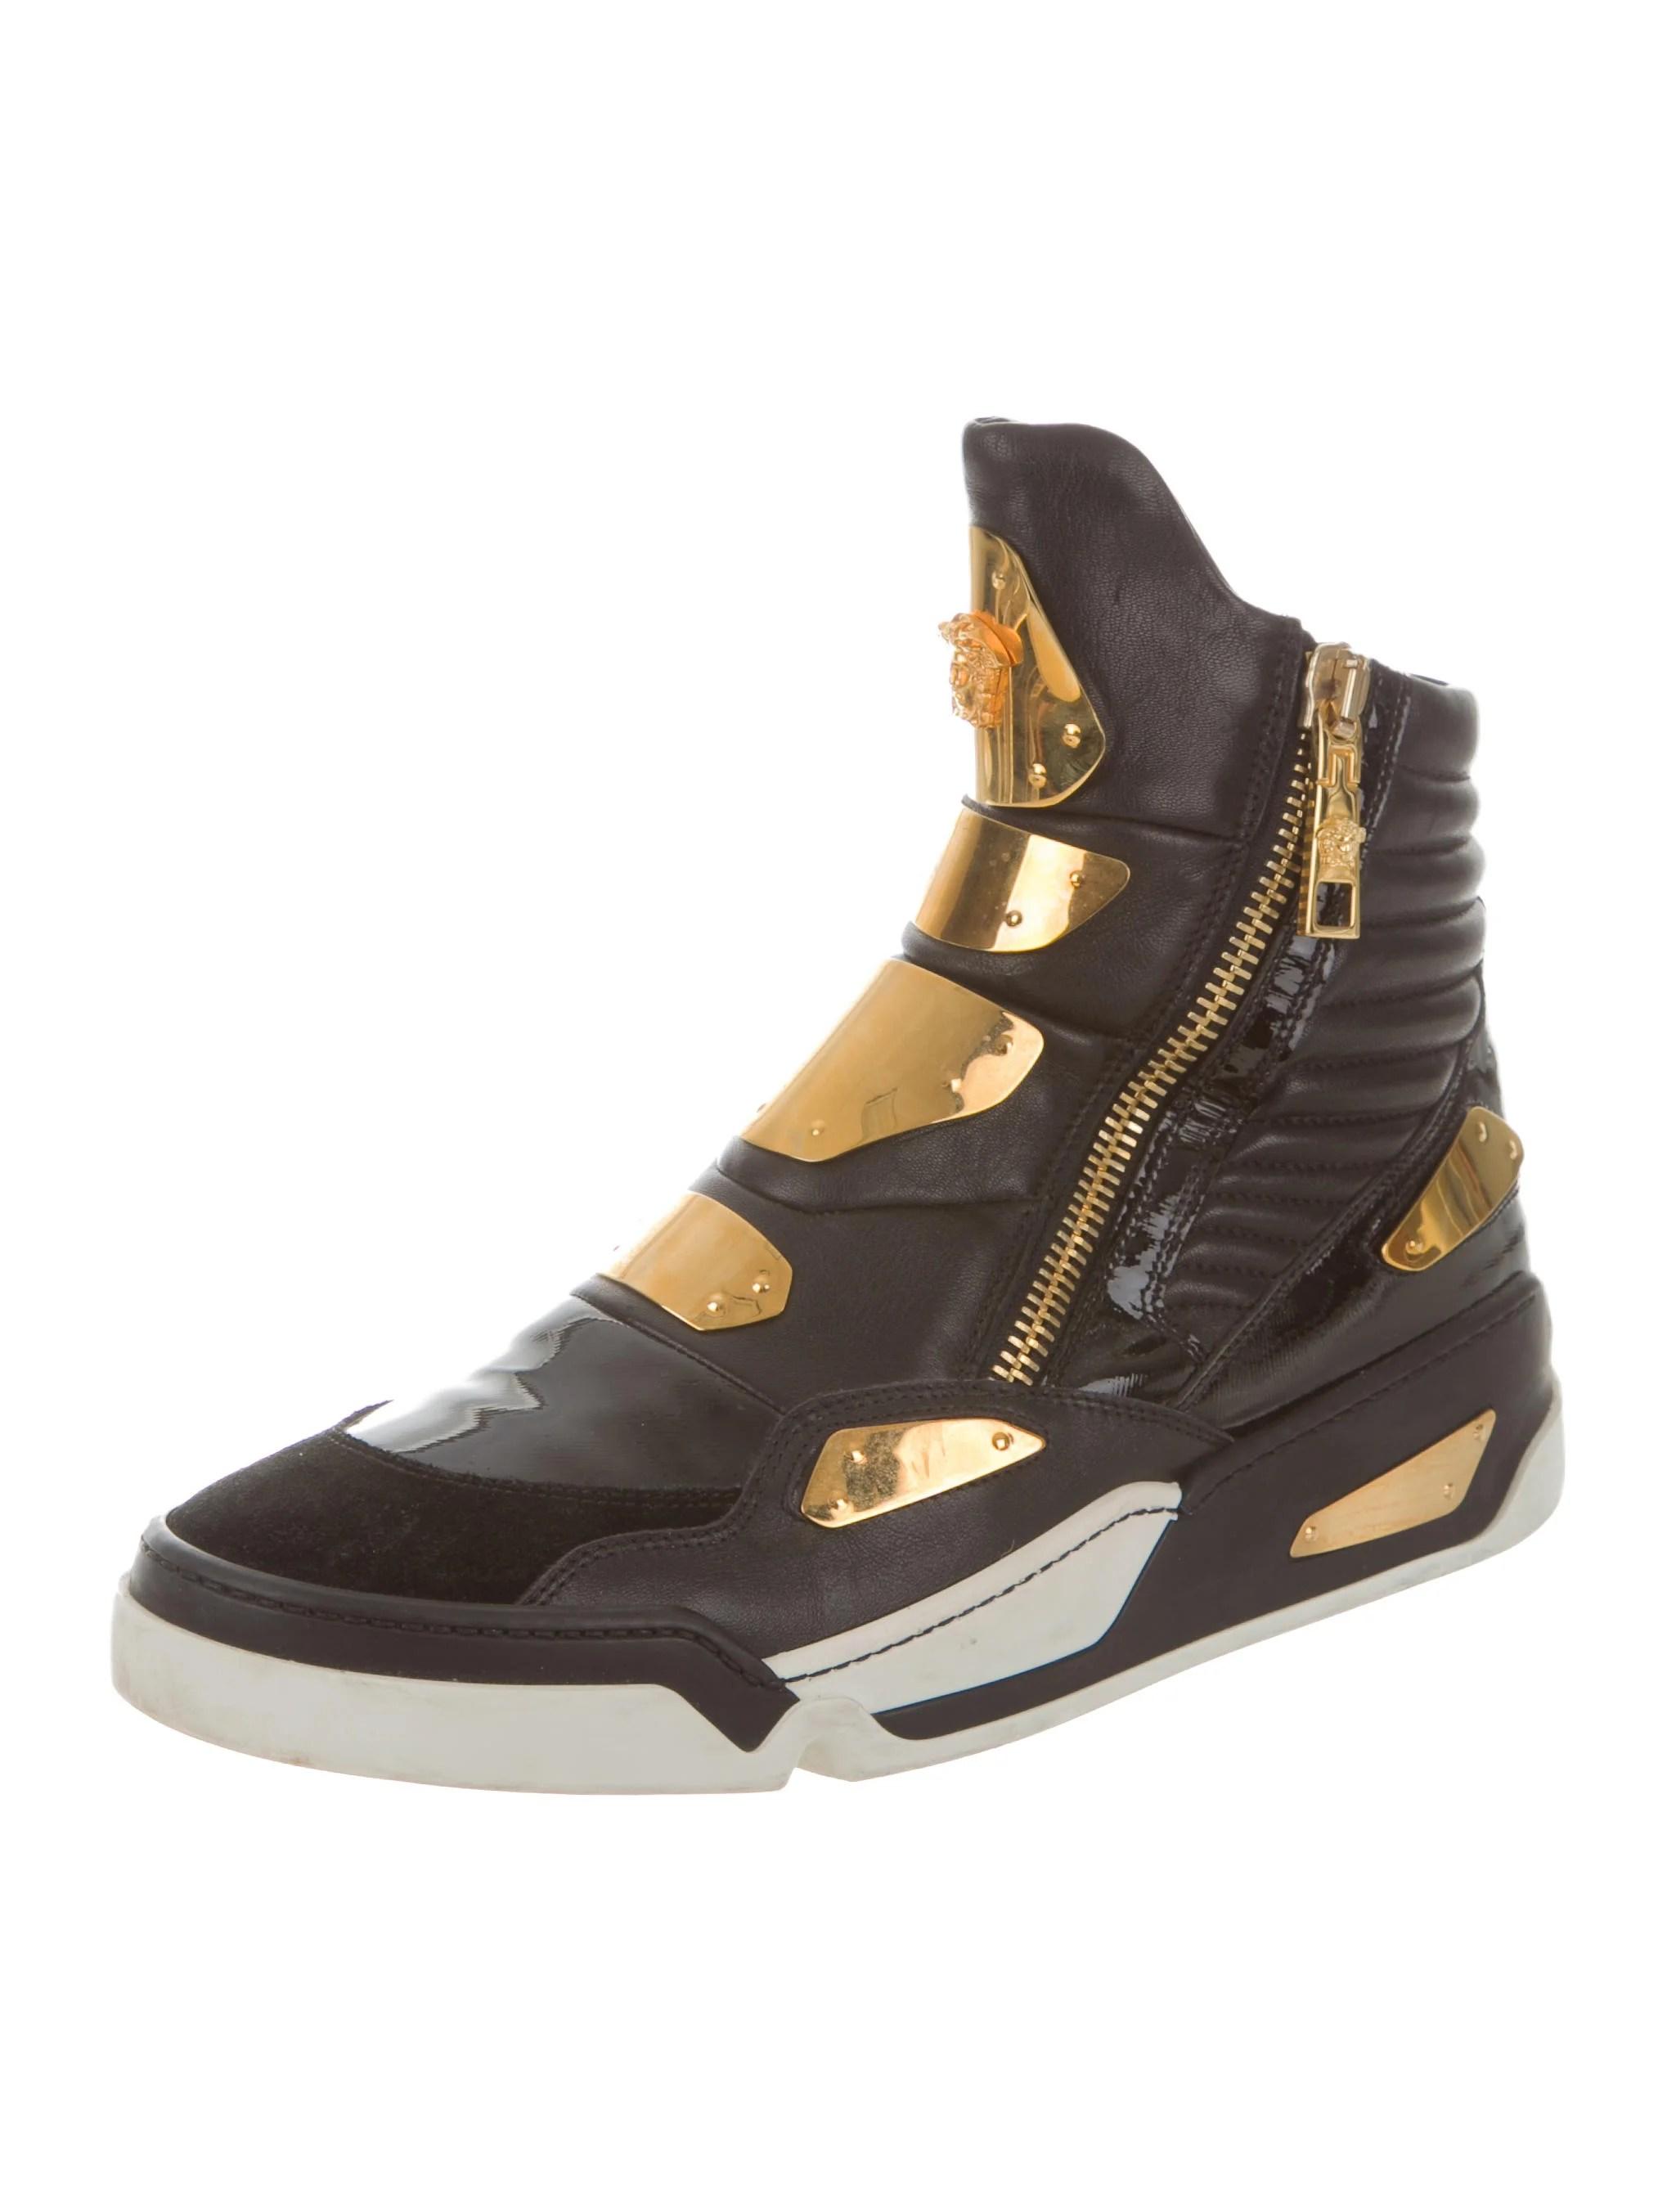 Versace Medusa HighTop Sneakers  Shoes  VES27255  The